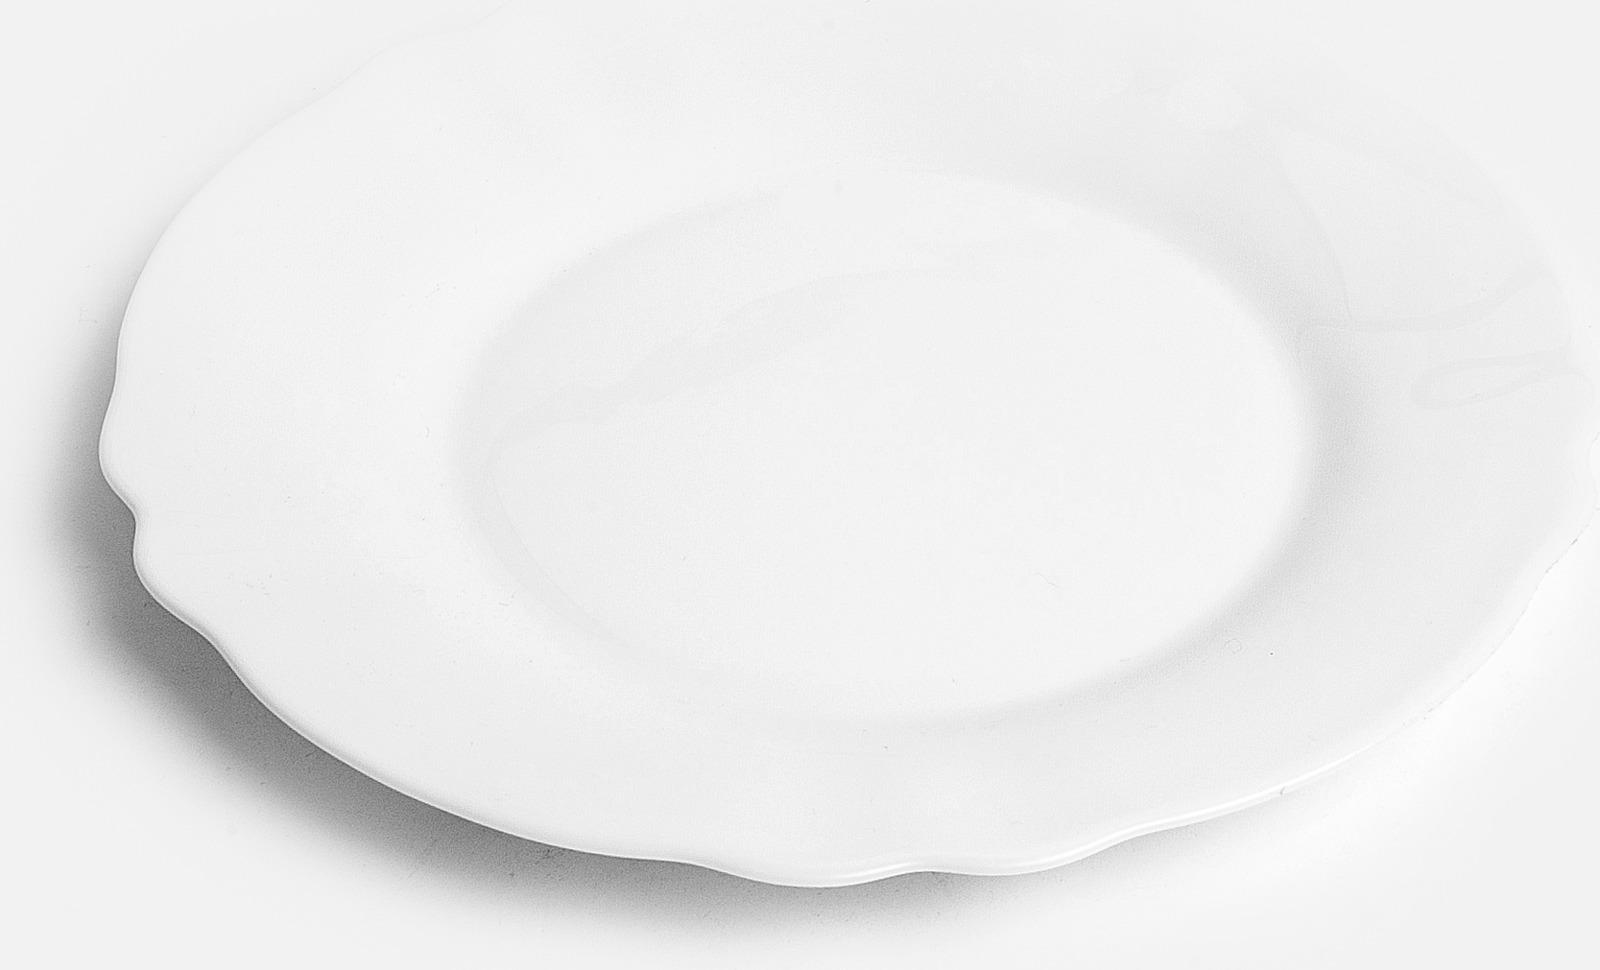 Тарелка десертная Luminarc Луи Xv, J7333, белый, диаметр 19 см тарелка luminarc луи xv 24см обеденная стекло